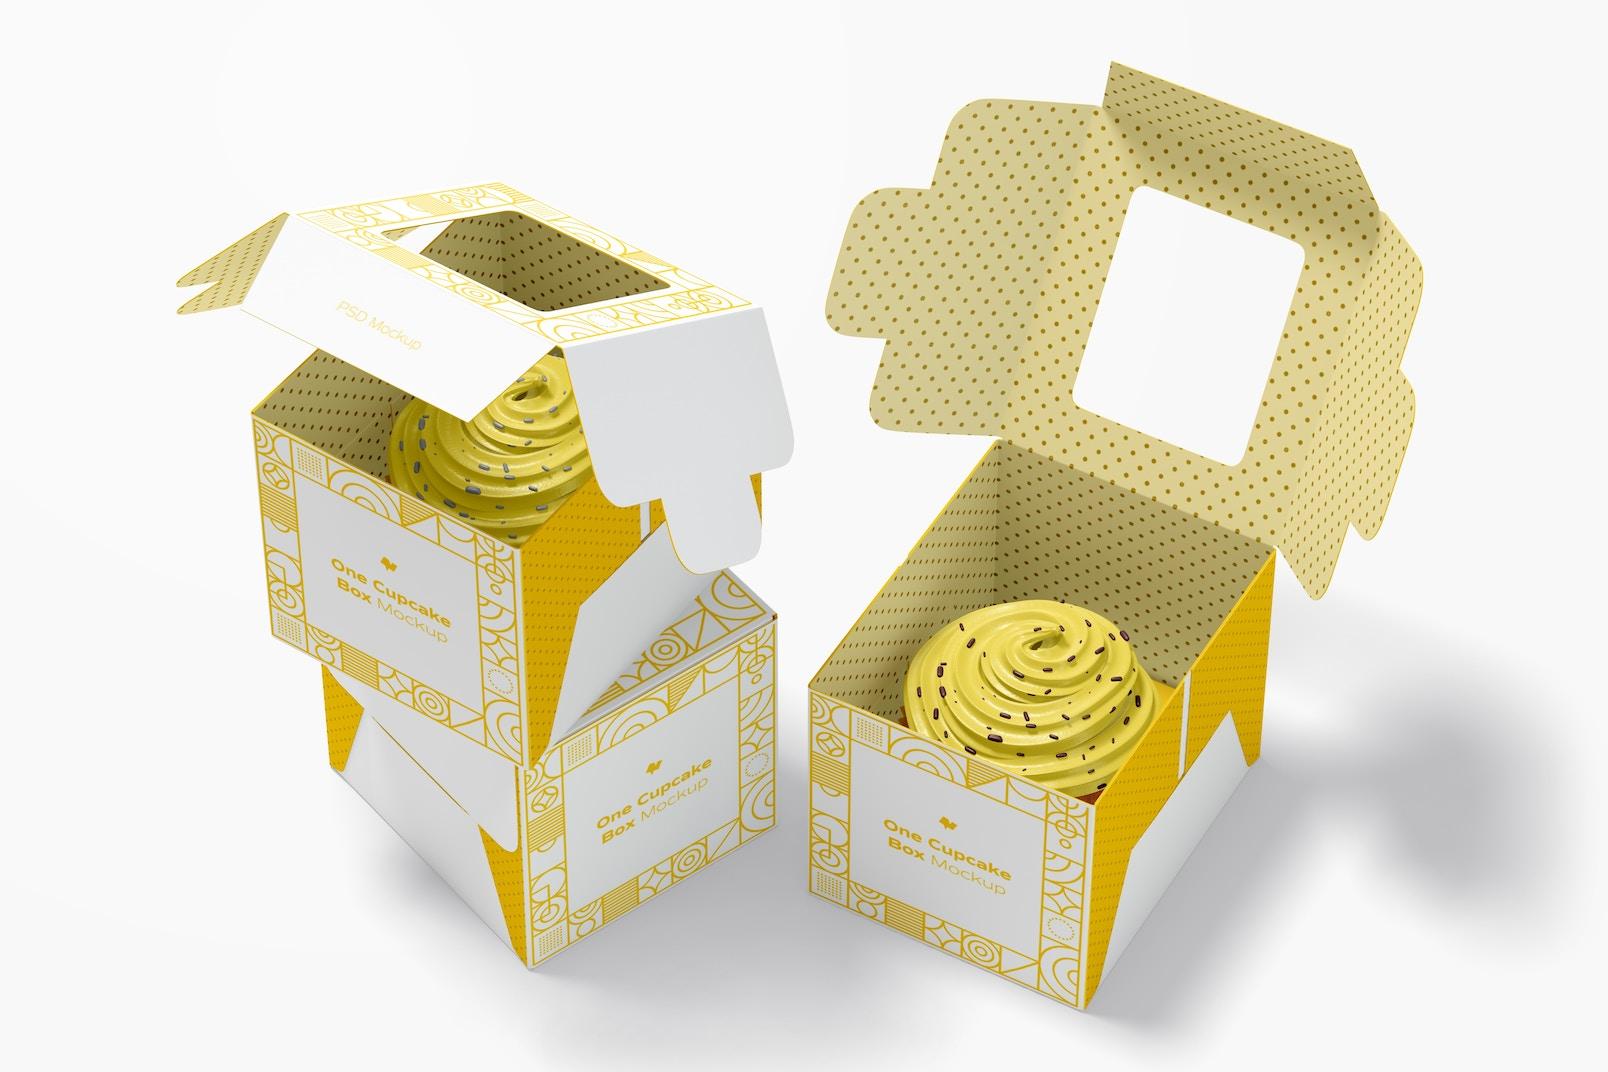 One Cupcake Boxes Mockup, Opened